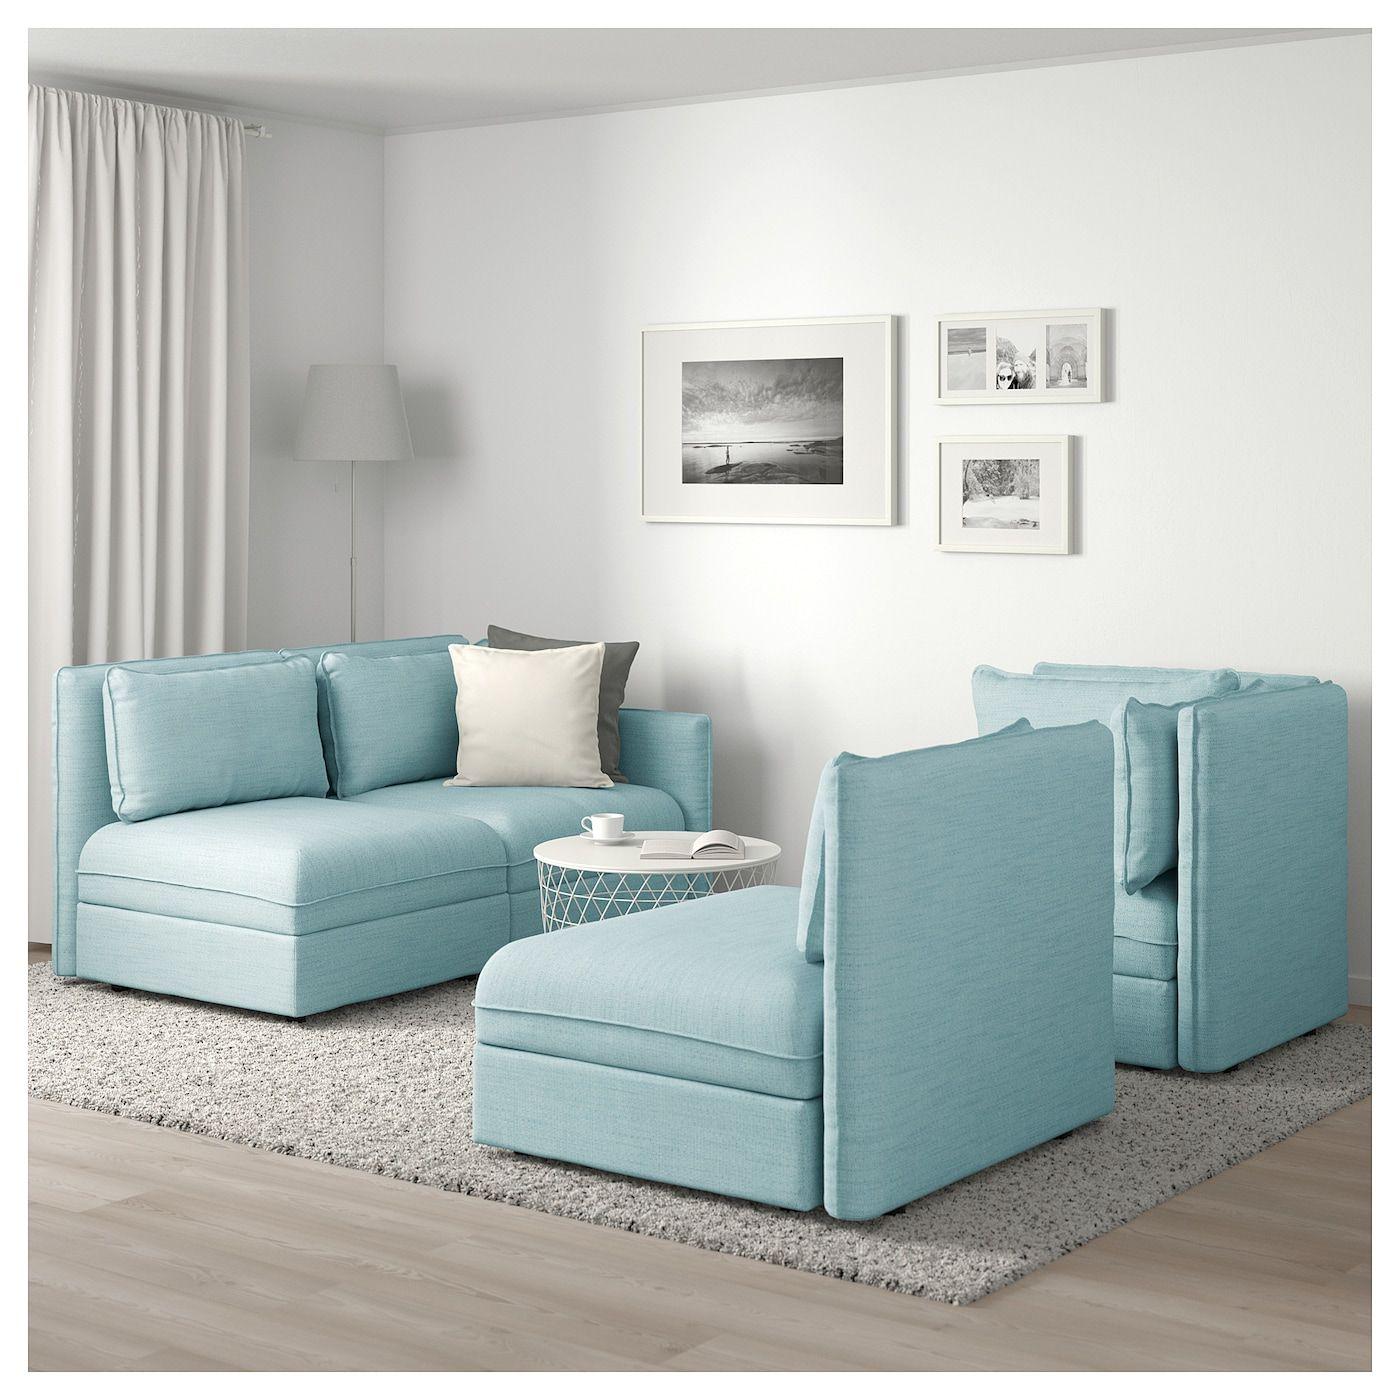 Vallentuna Canape D Angle Modulaire 3 Places Avec Rangement Hillared Bleu Clair Ikea Modular Corner Sofa Vallentuna Corner Sofa